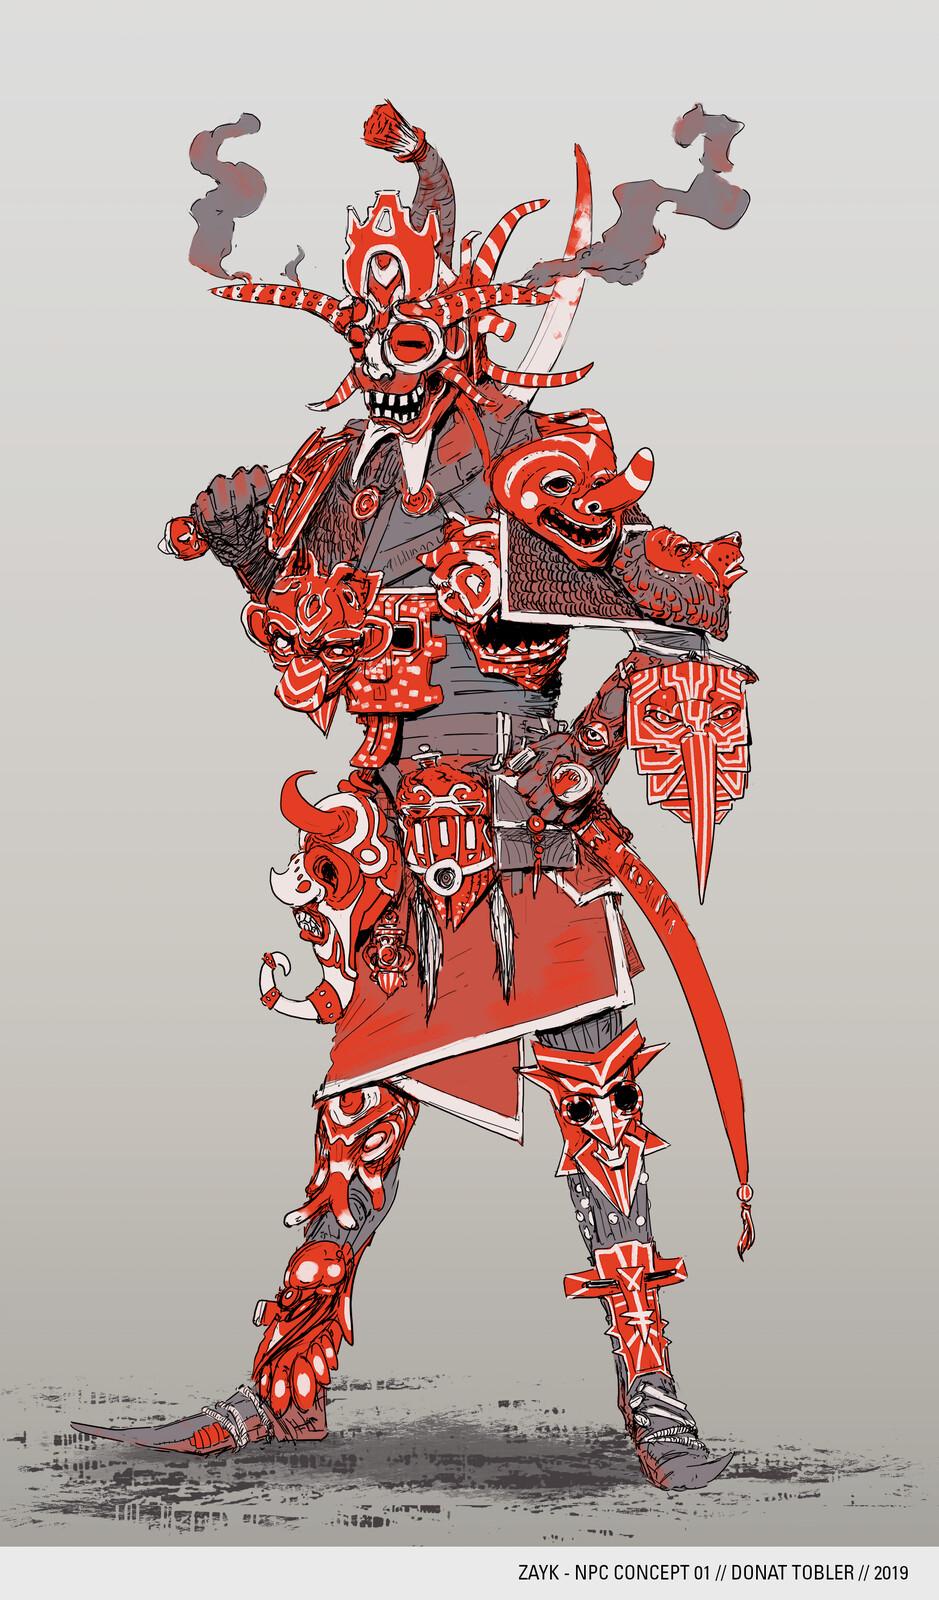 Zayk - NPC Concepts